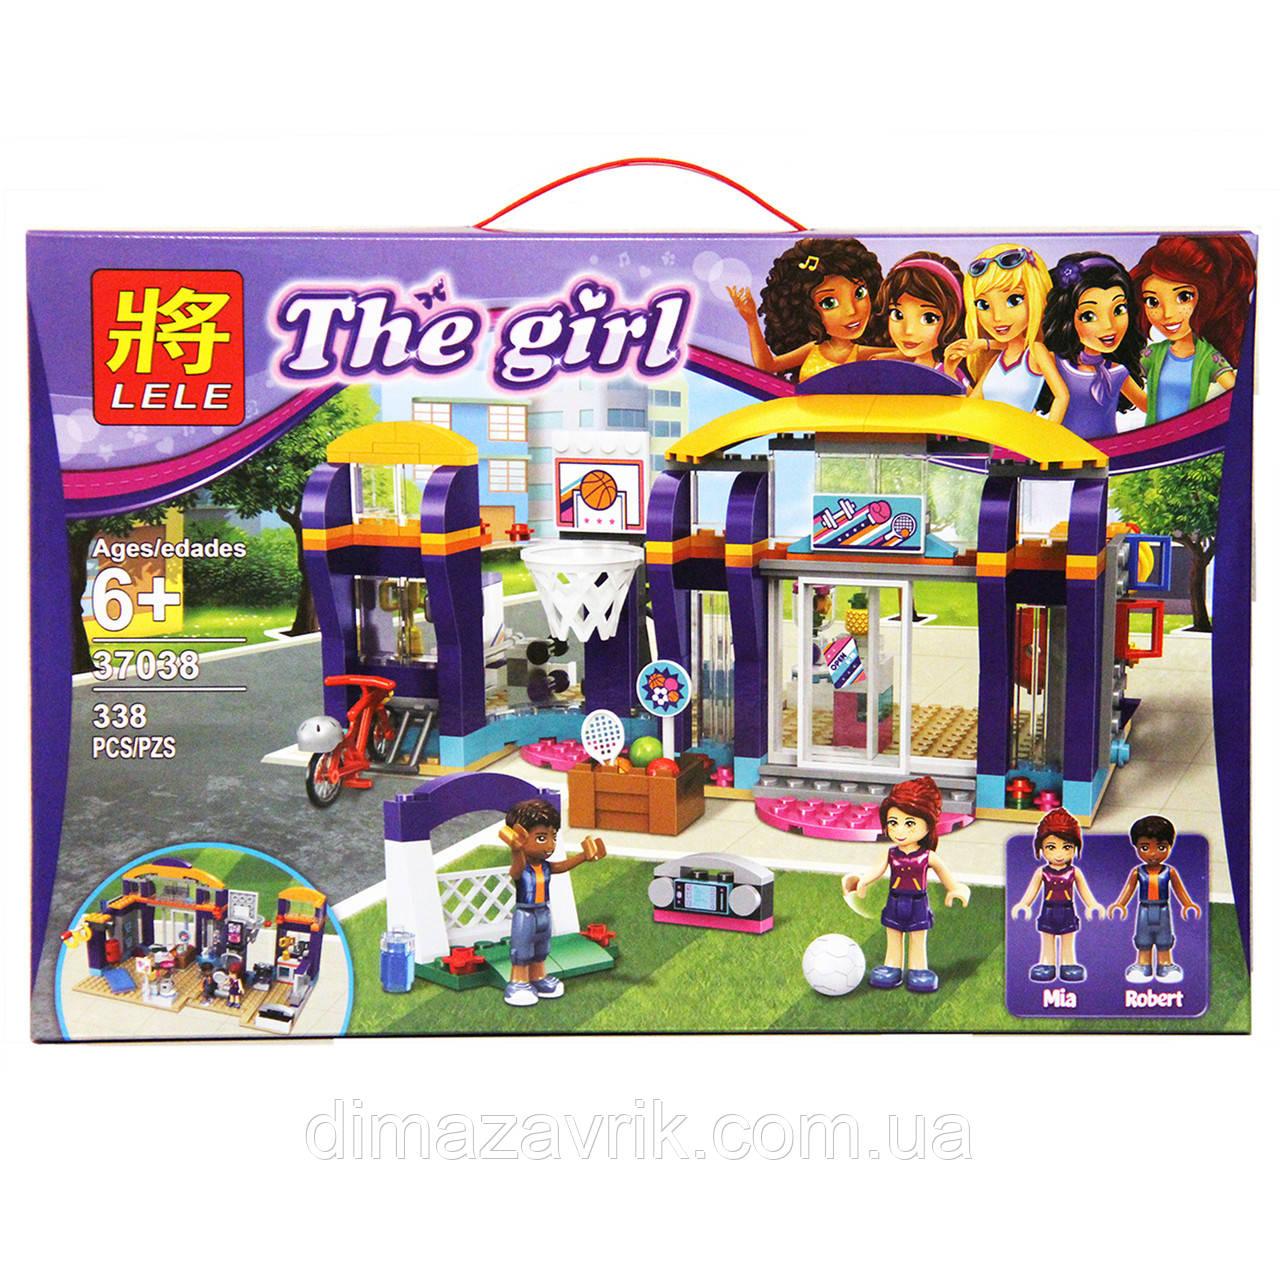 "Конструктор Lele 37038 (Аналог Lego Friends 41312) ""Спортивный центр"" 338 деталей"